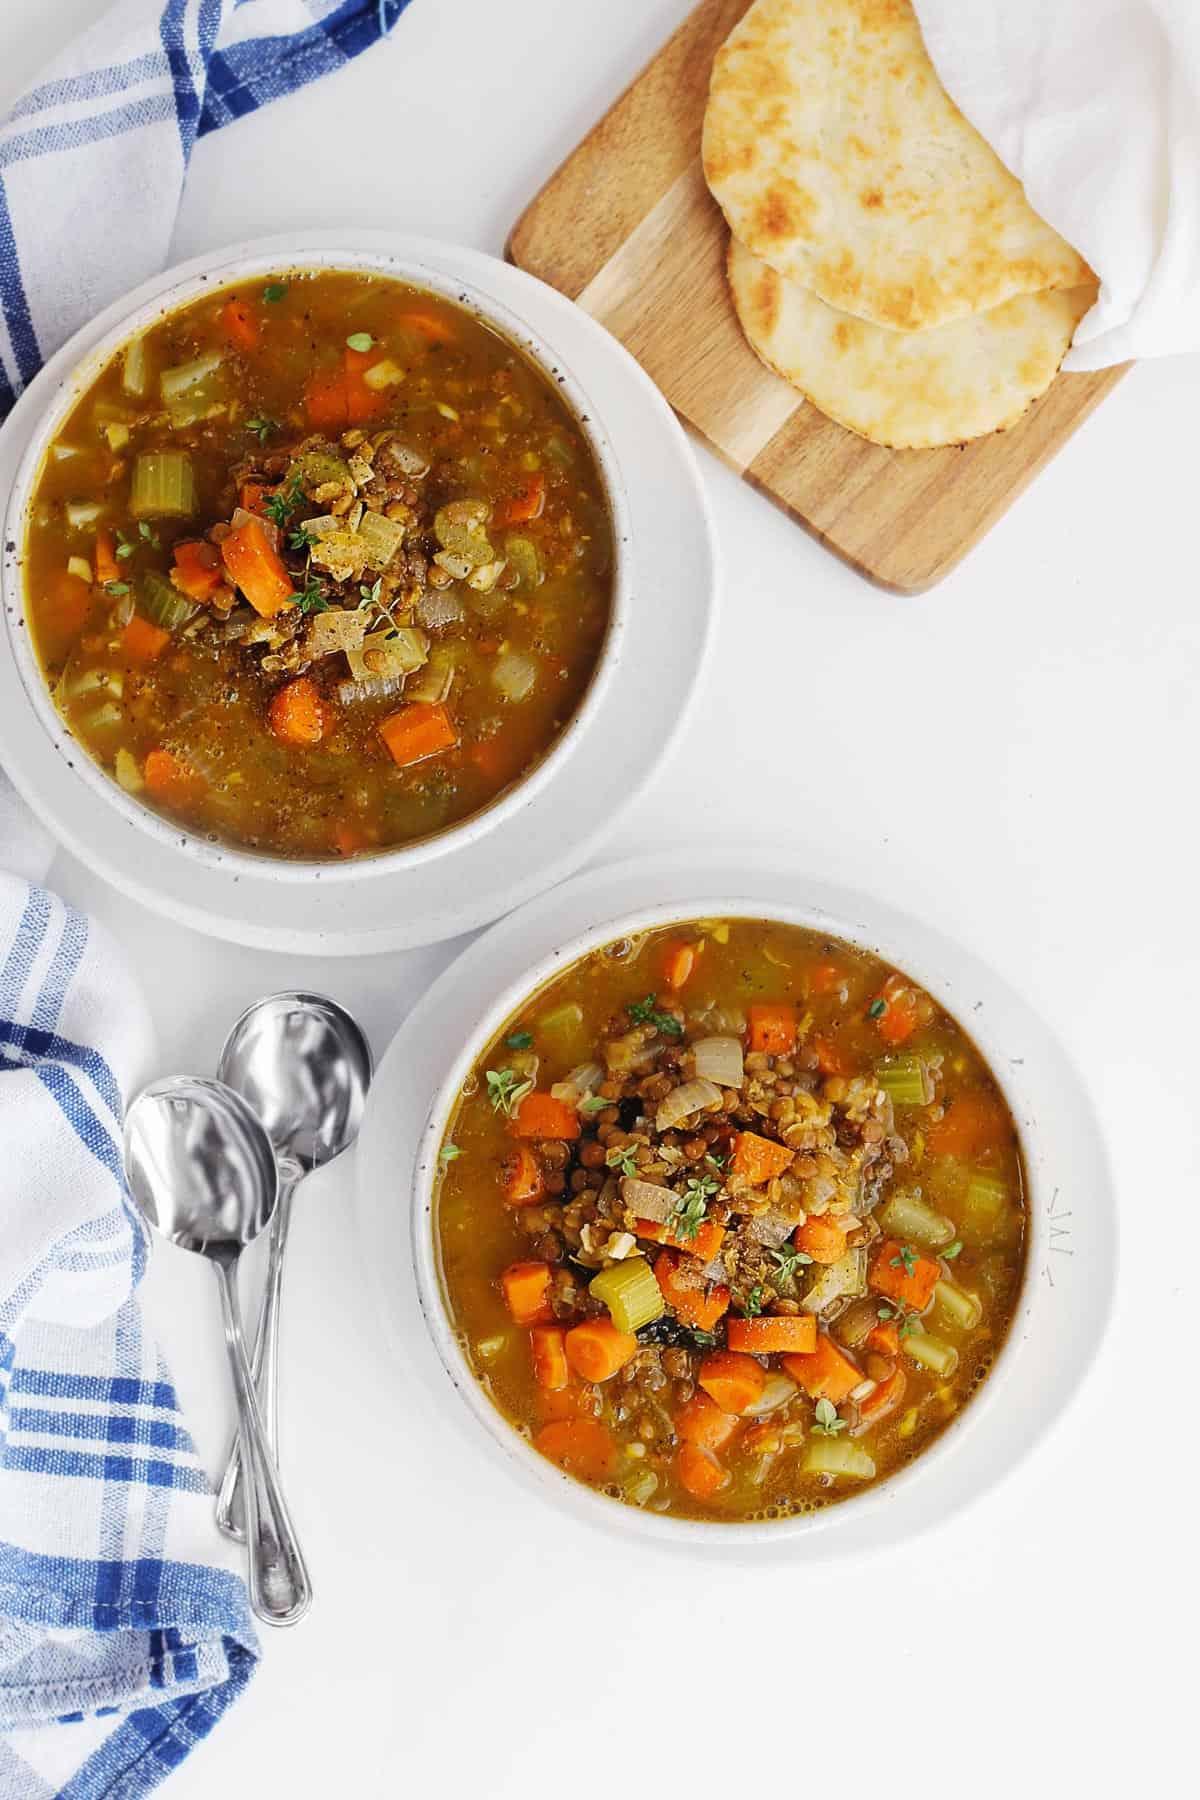 fall pumpkin lentil stew in two bowls